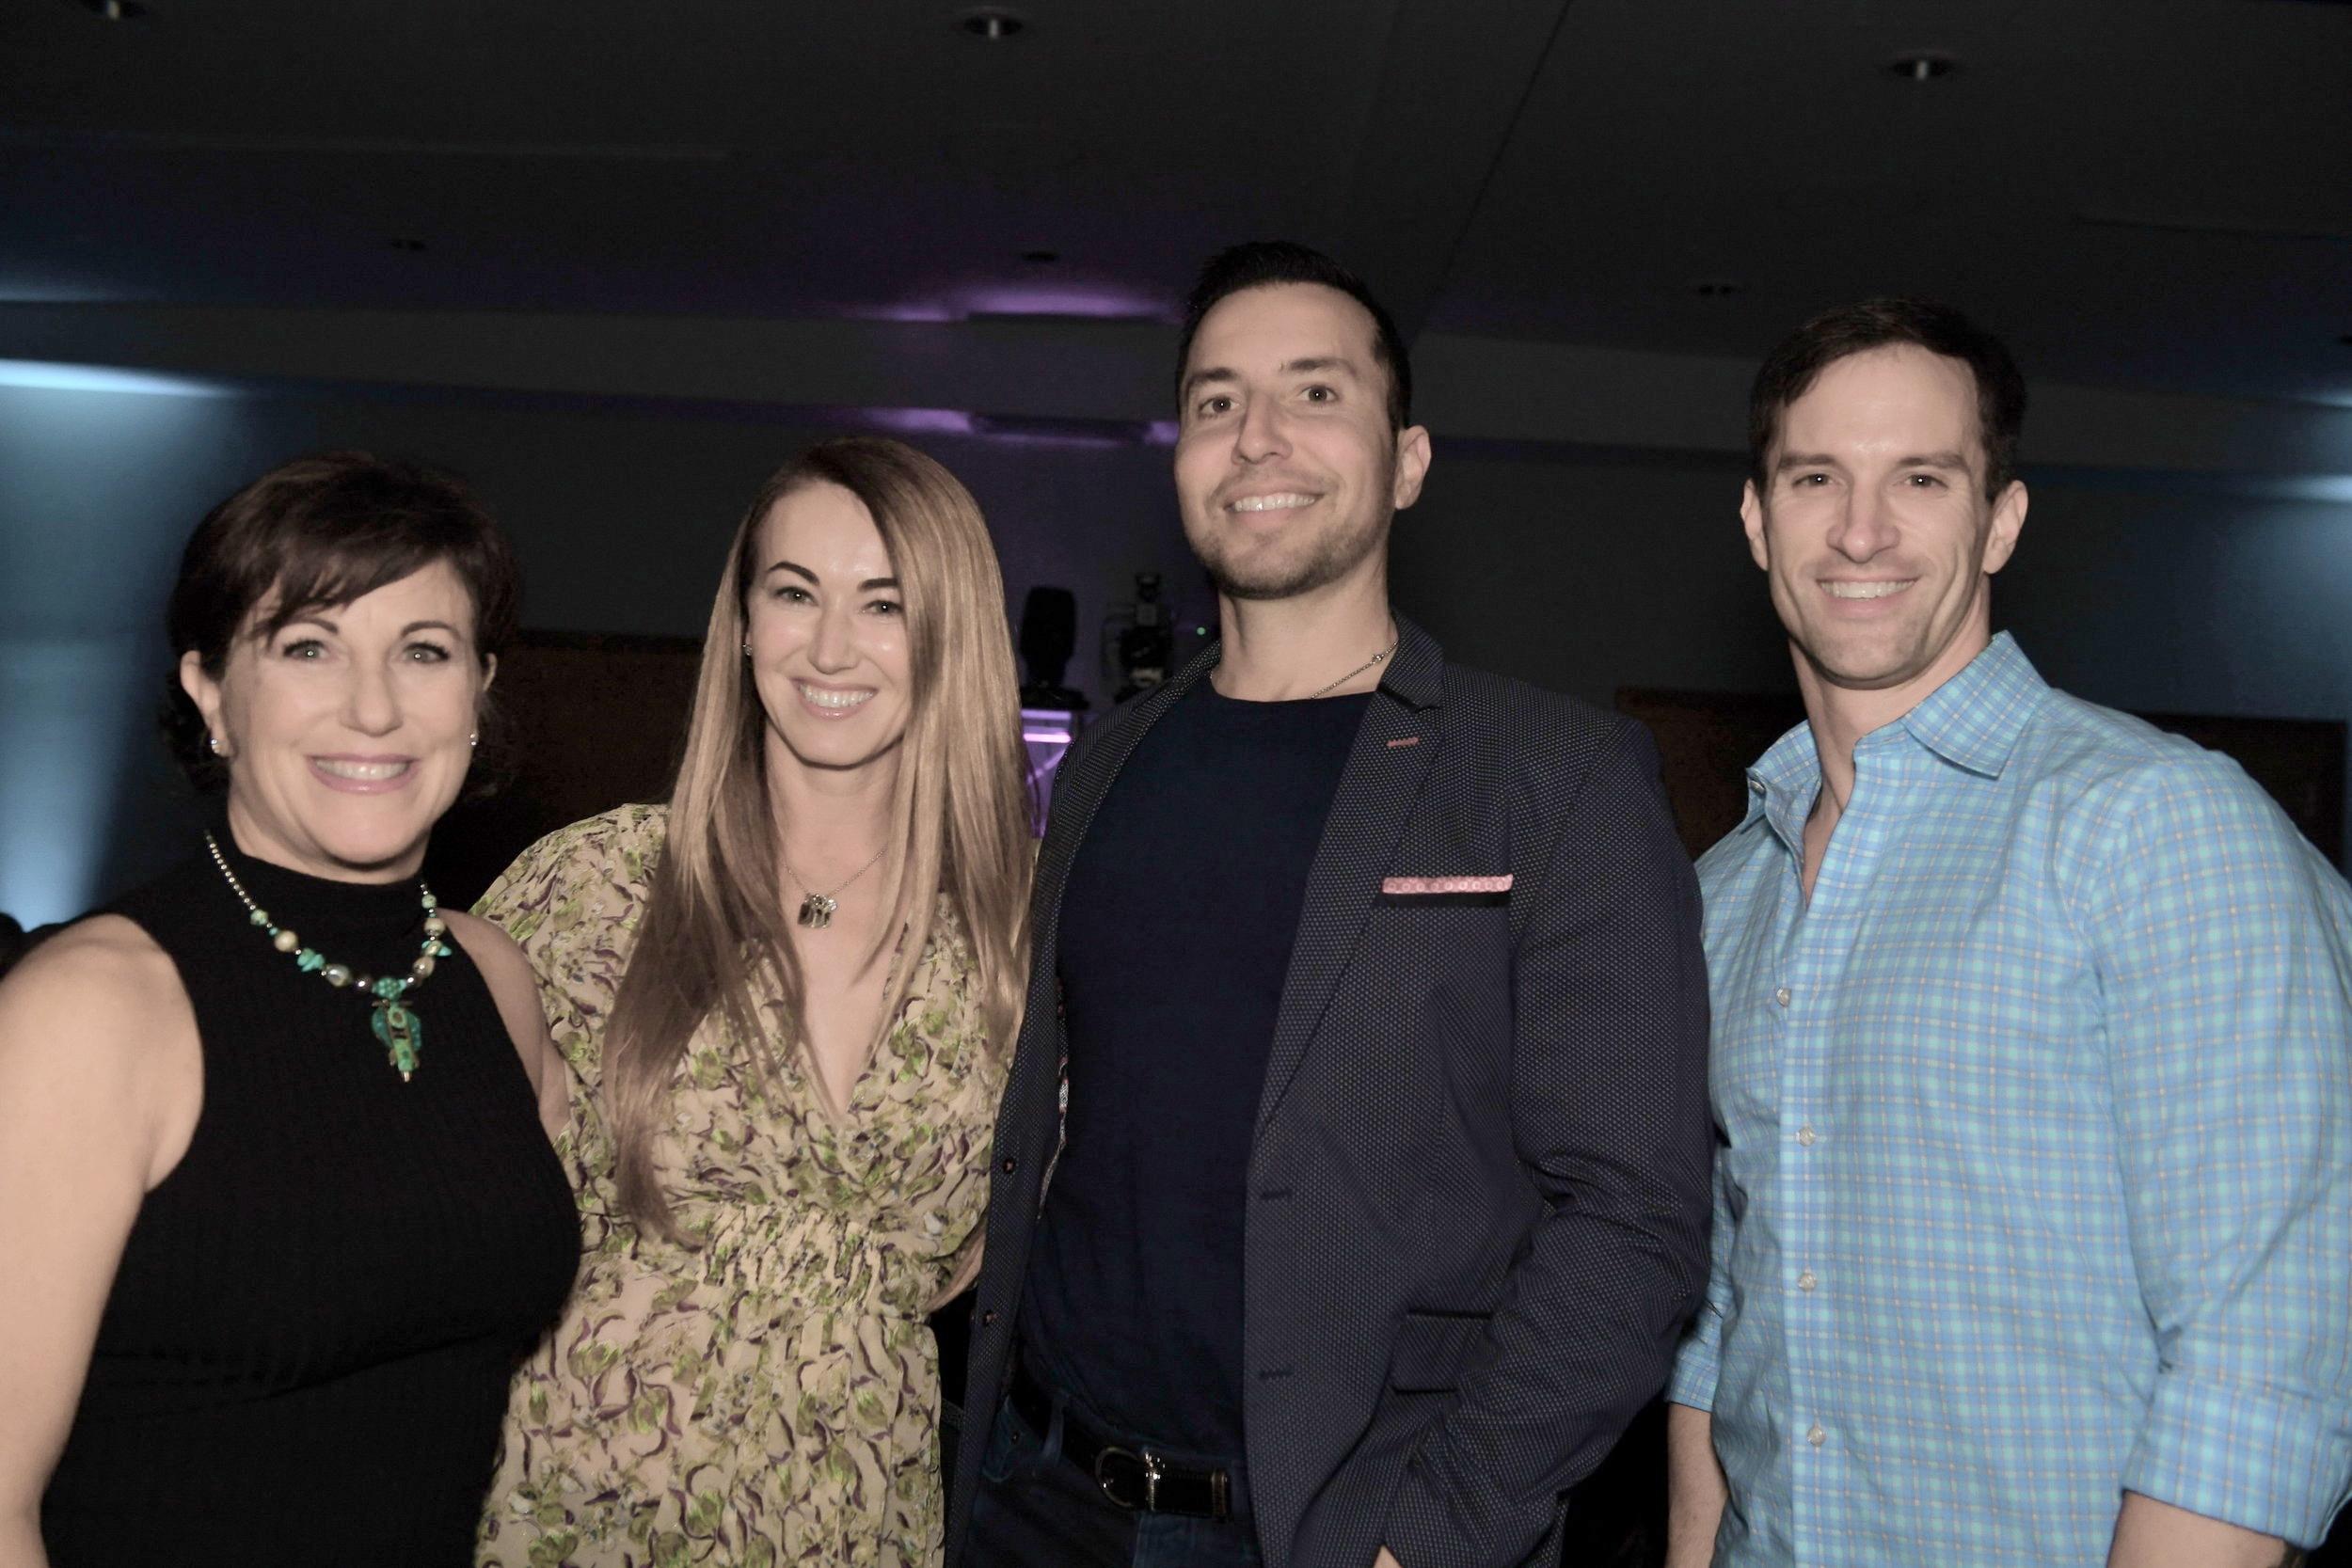 AEGT WeekIX judges Sherry Tautiva, P.j. Rizvi, Chris Desino and Ben Schultz. DDeRosa photo.